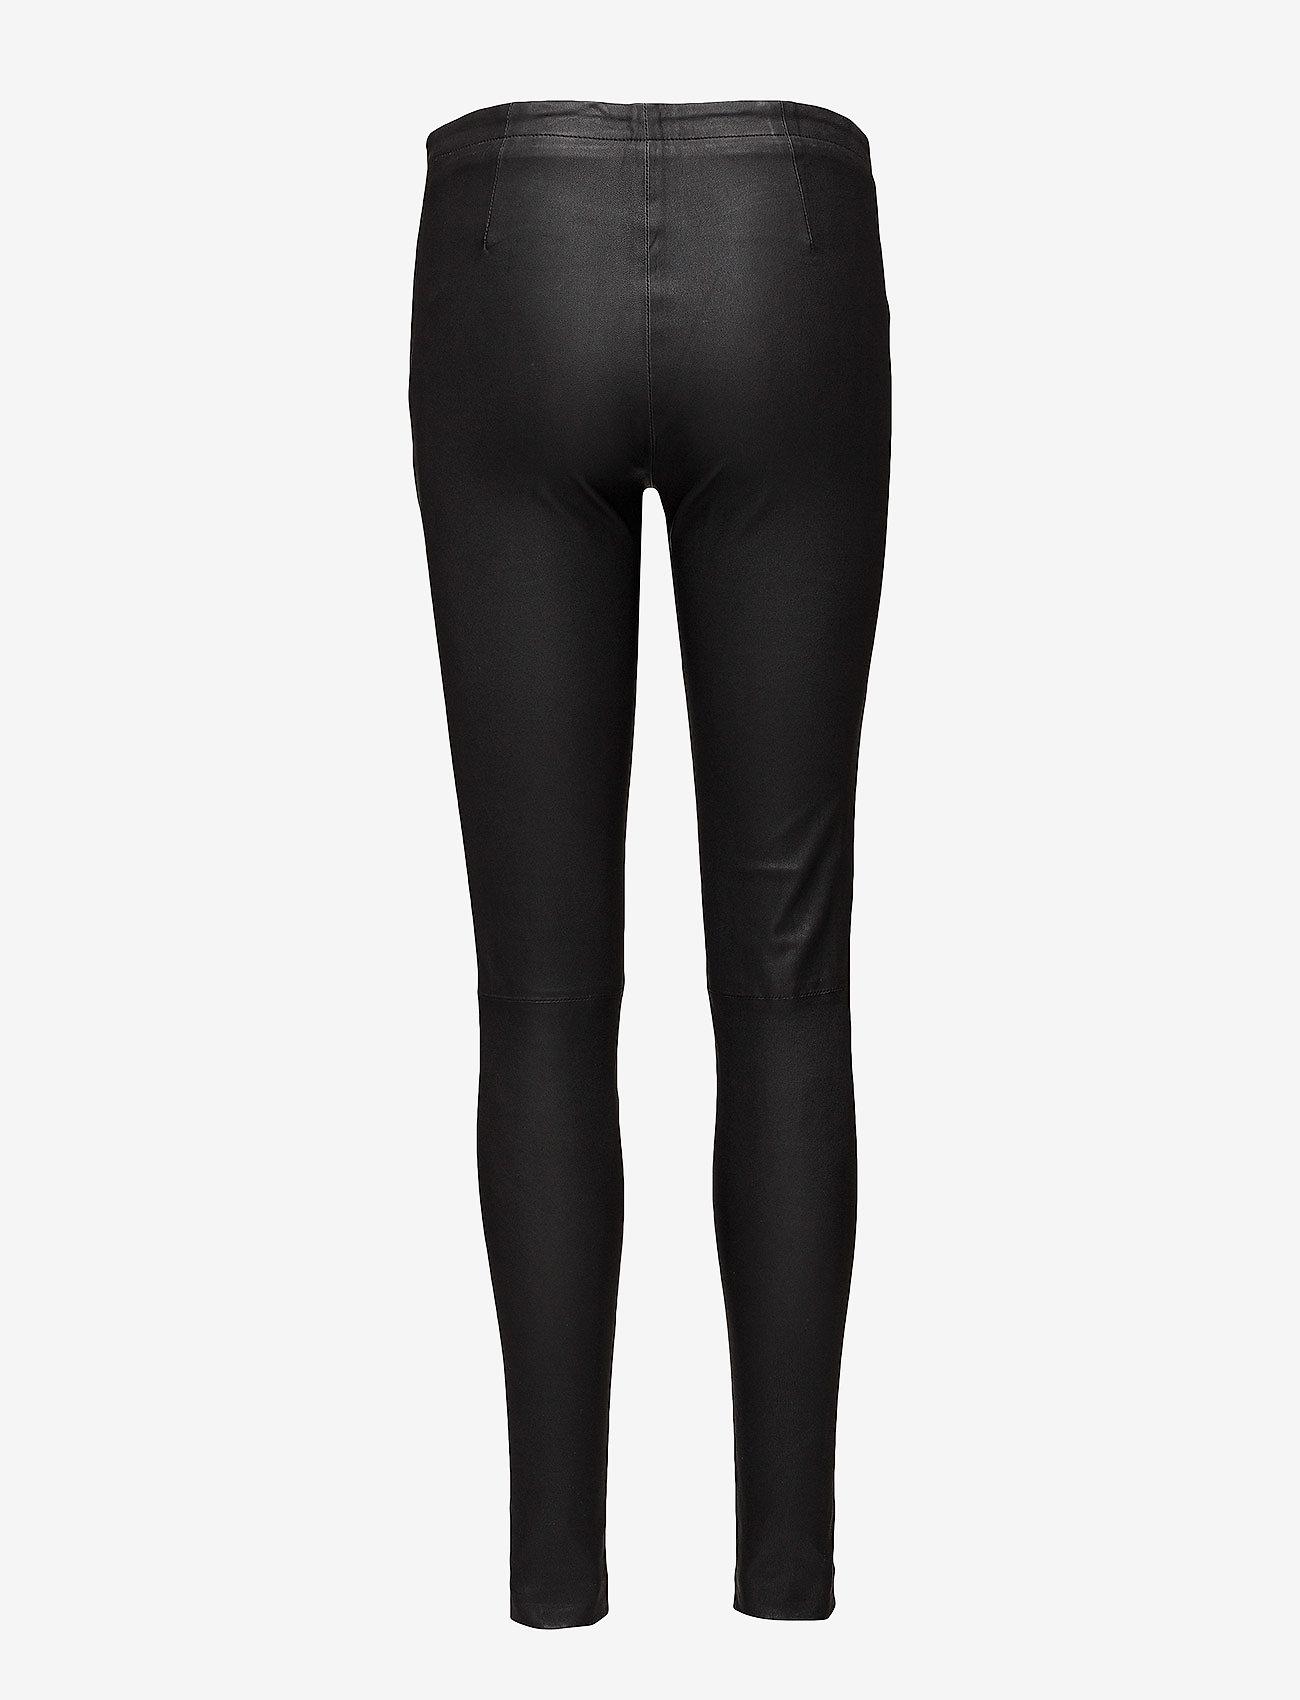 Rosemunde - Trousers - broeken med skinny fit - black - 1